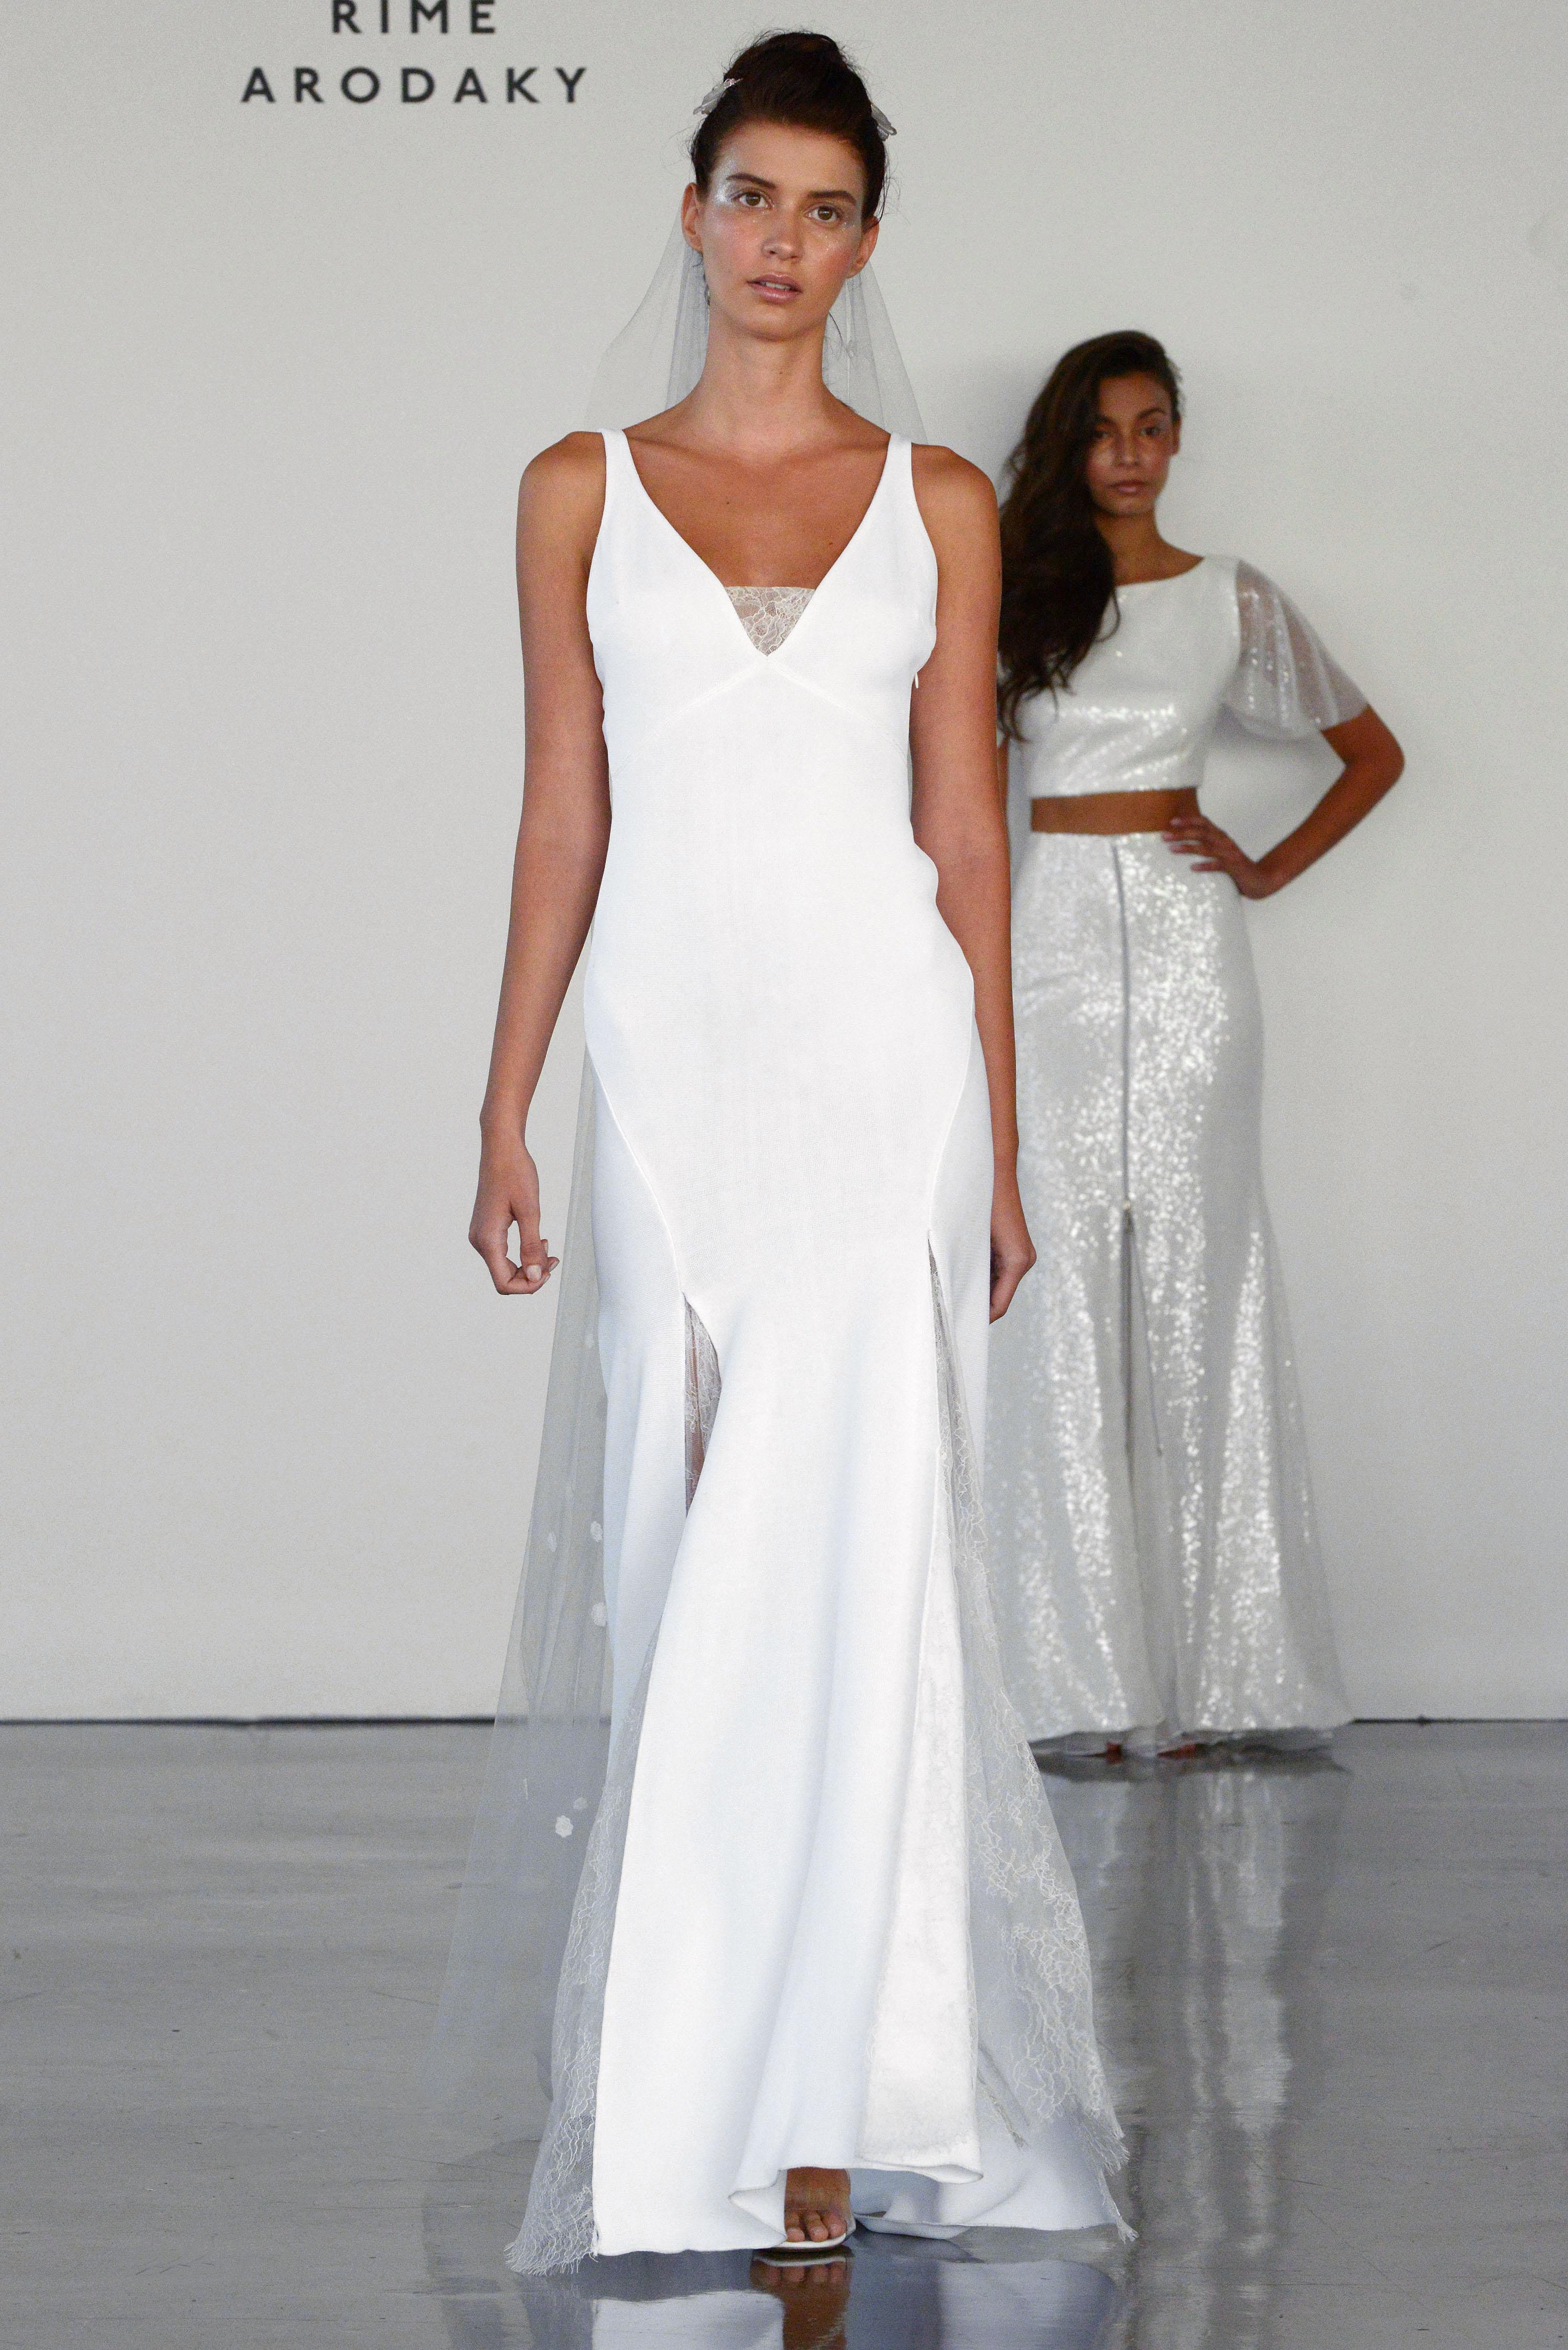 Rime Arodaky wedding dress 30 Fall 2017